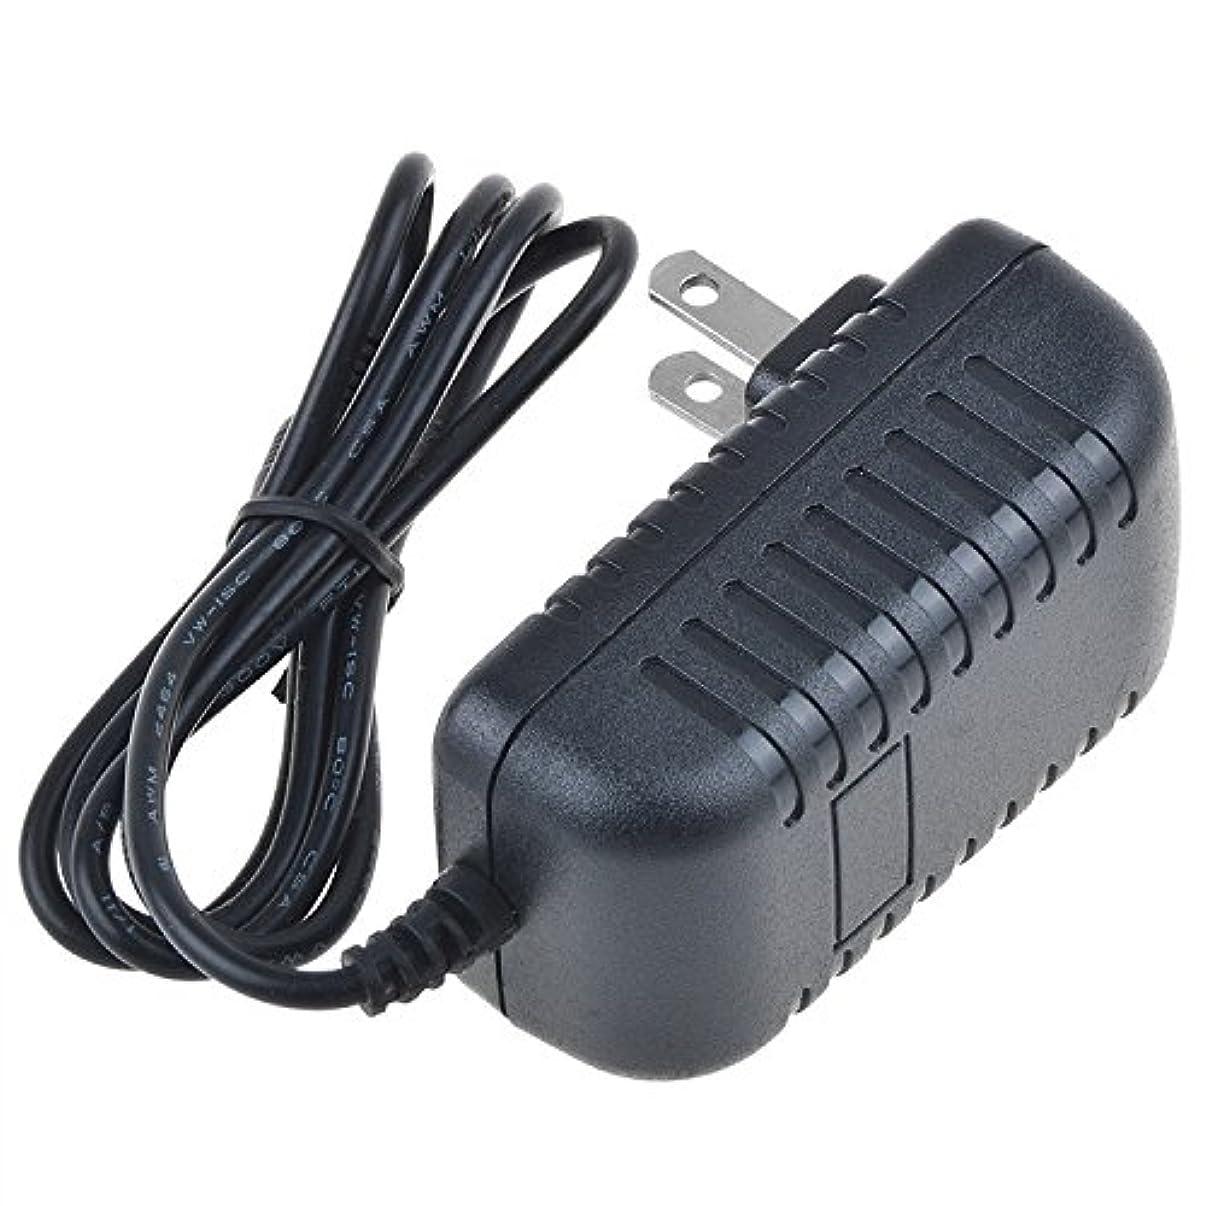 Digipartspower AC Adapter for CenturyLink ZyXEL PK5001Z PK5001PK Modem Router Power Supply PSU